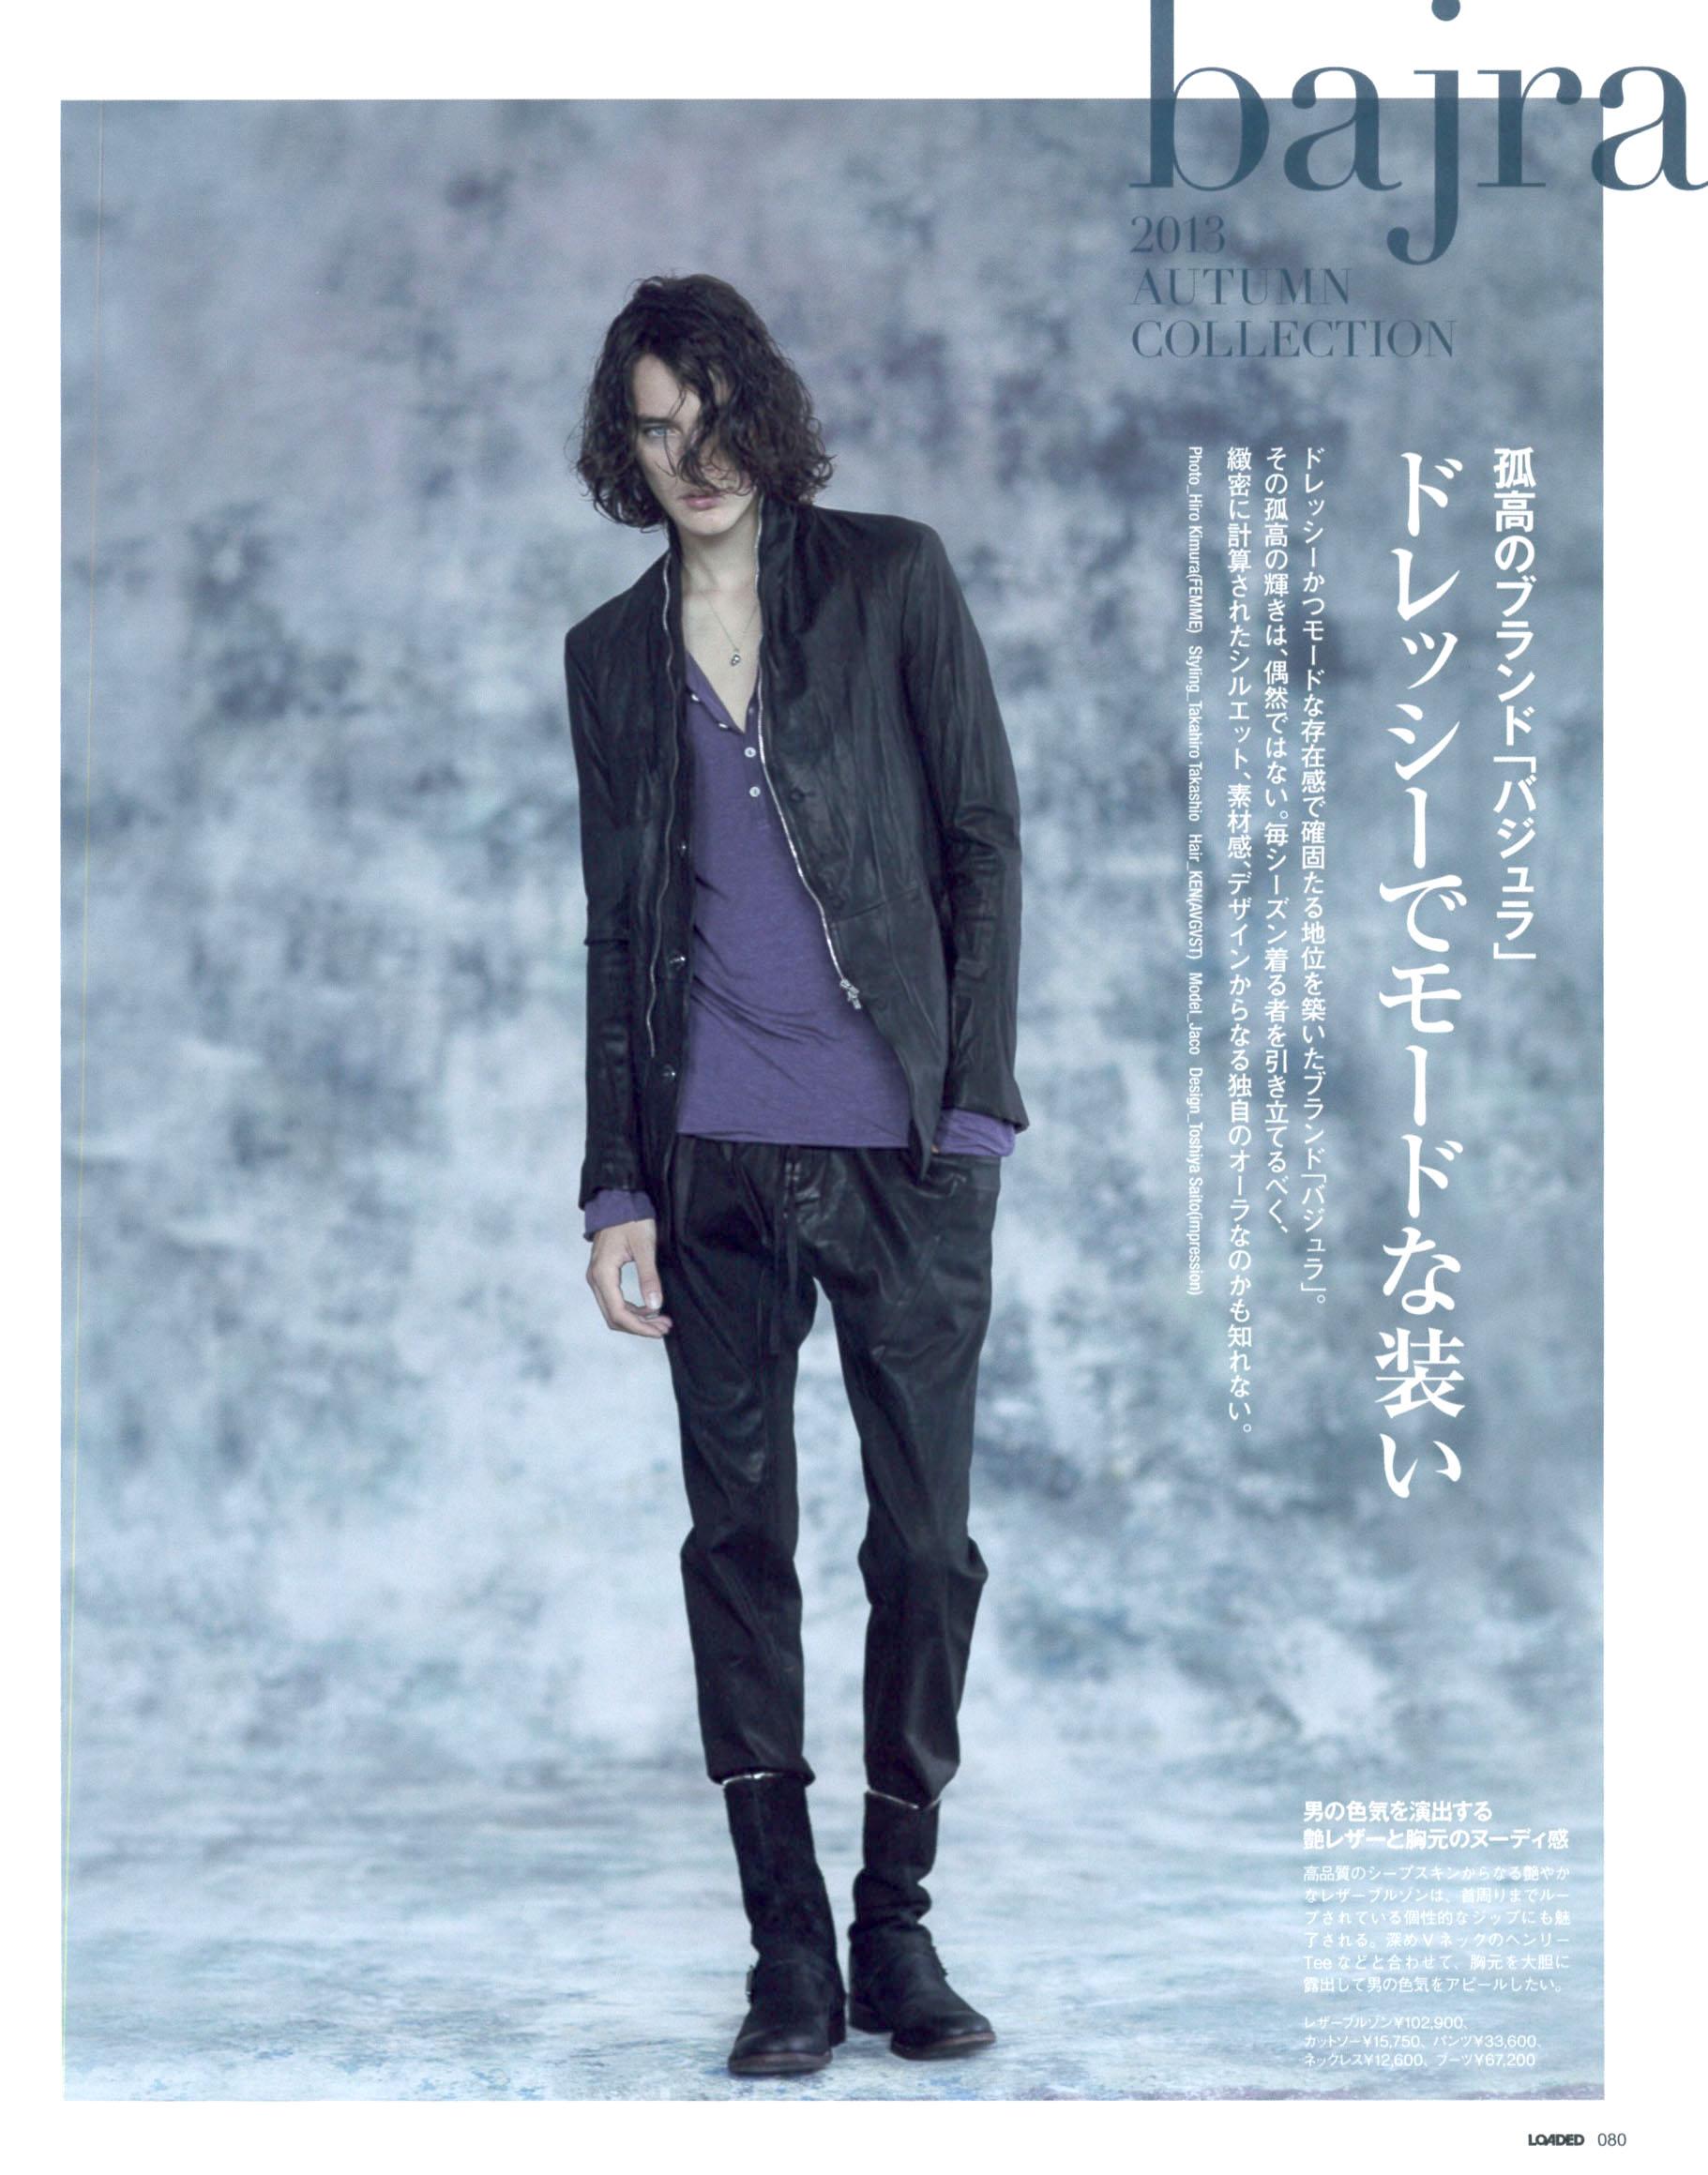 LOADED – bajra  KEN YOSHIMURA HAIR